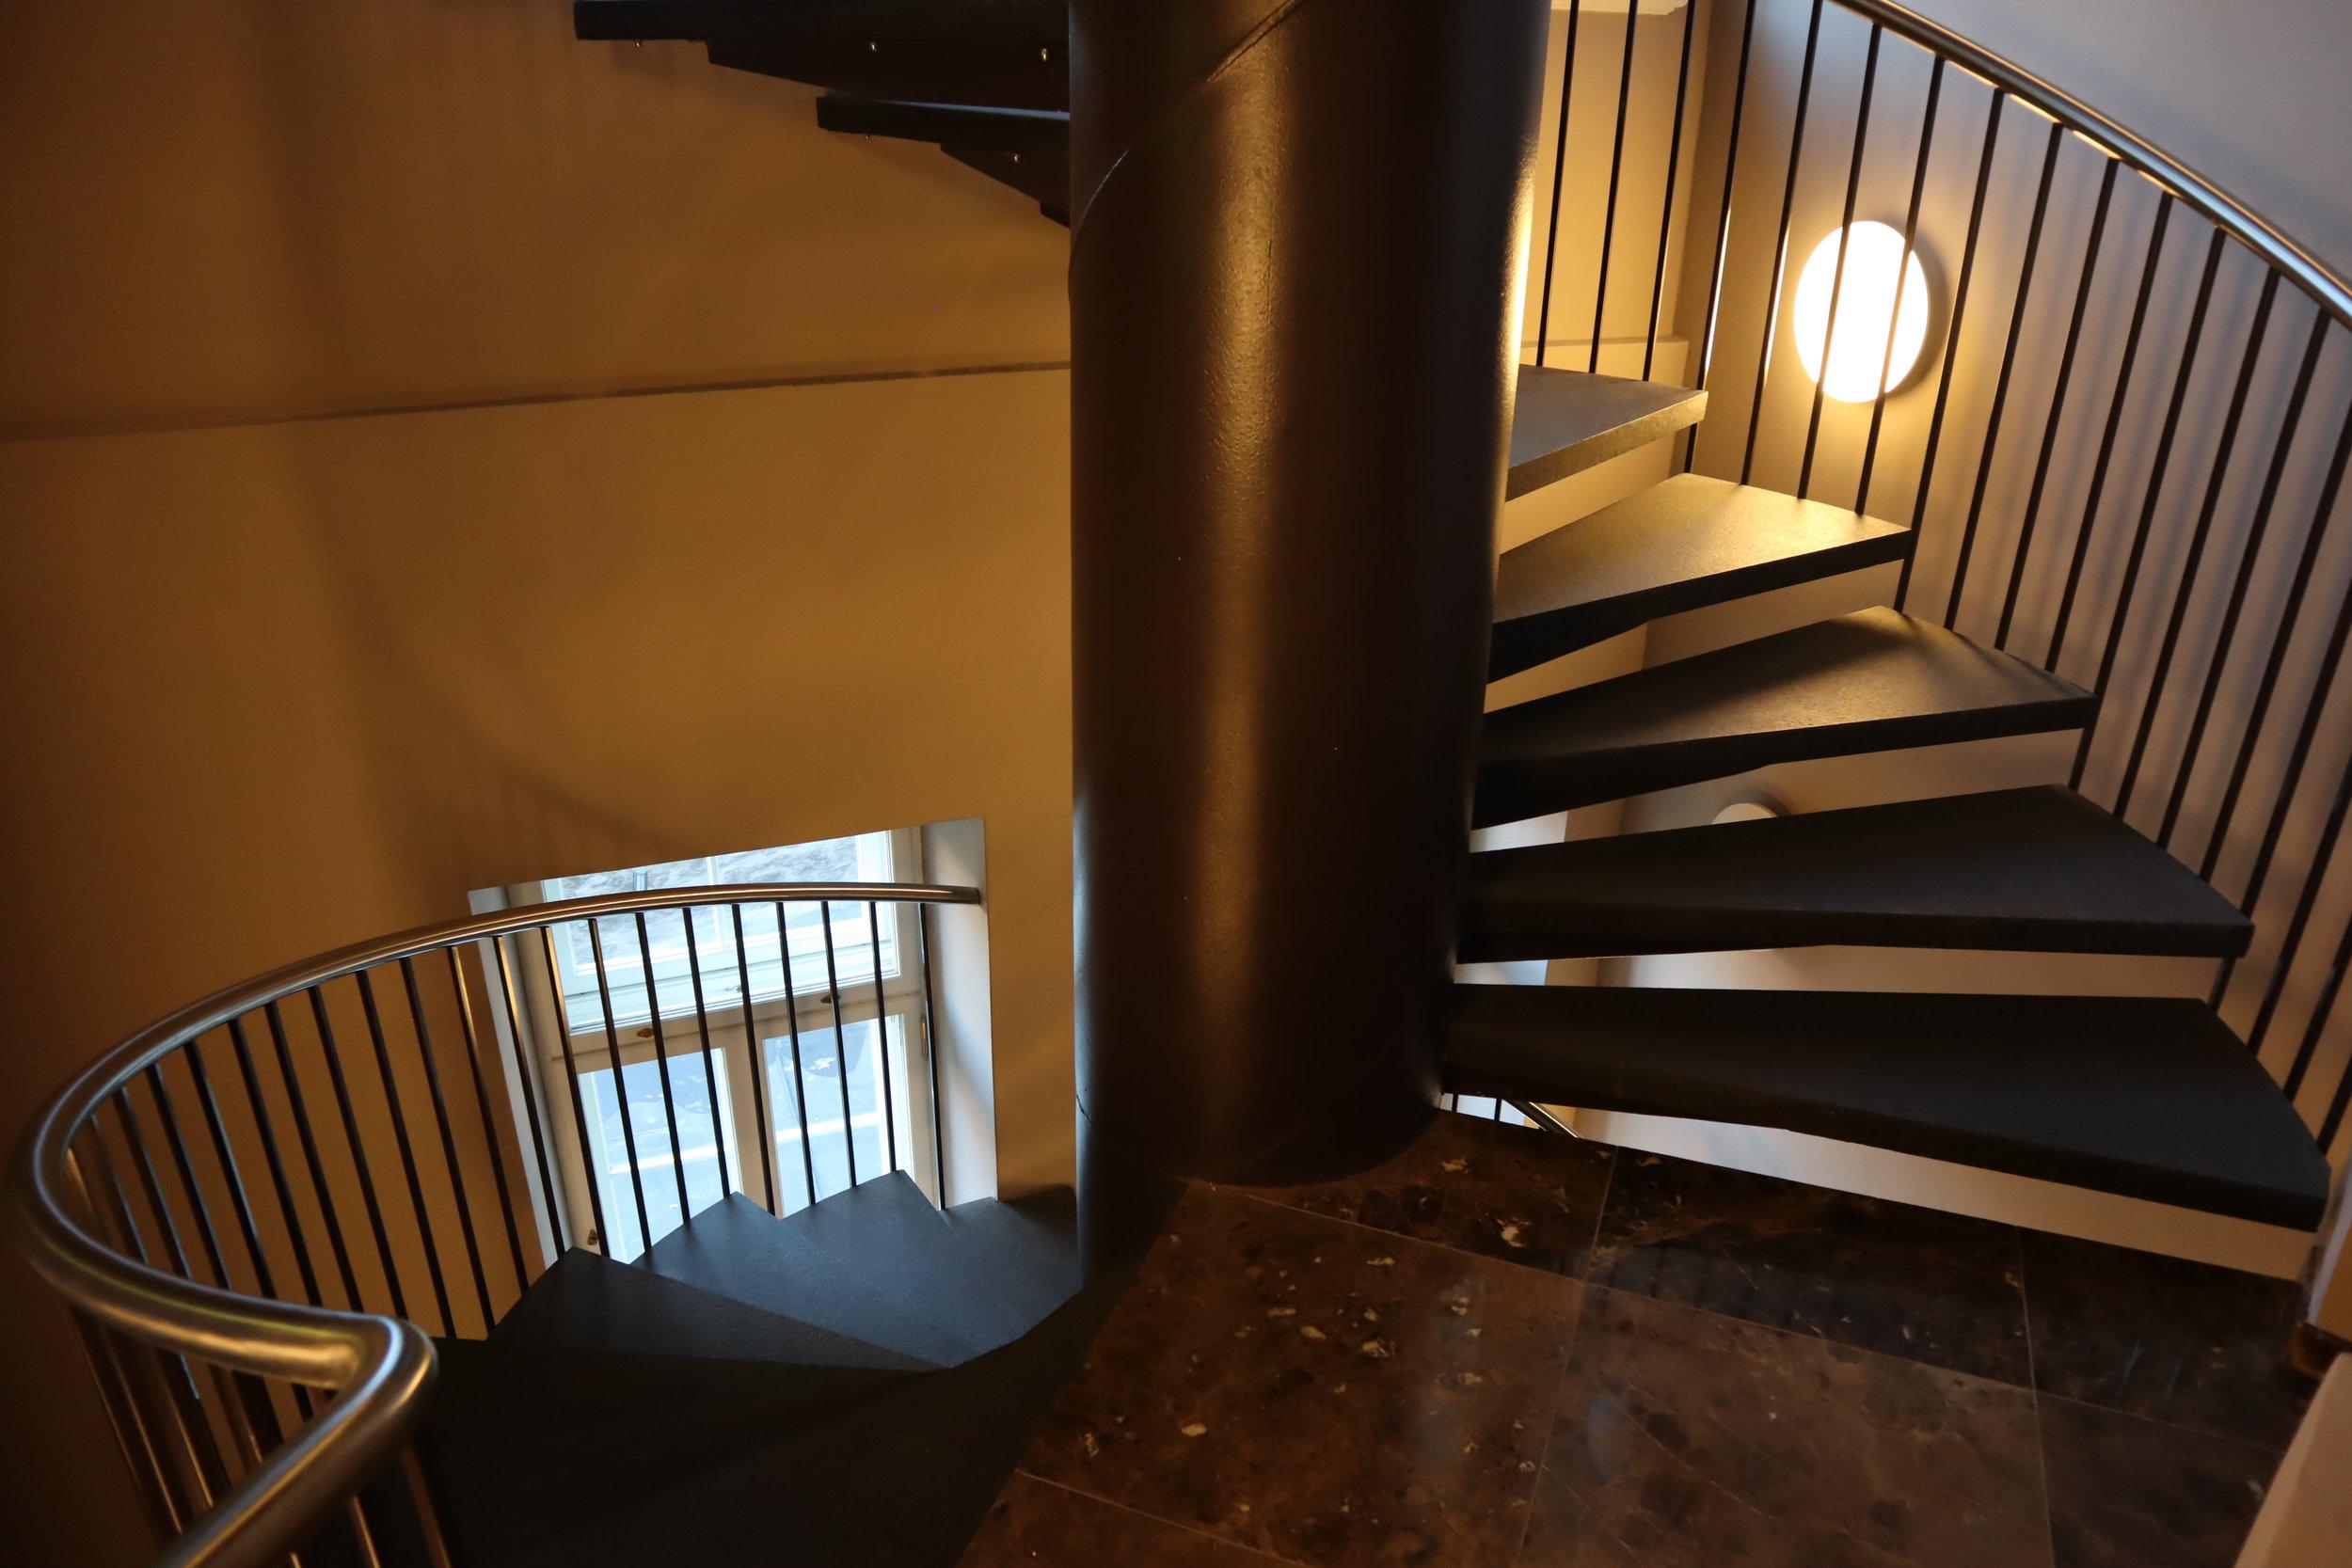 Hotel Telegraaf Tallinn – Spiral staircase